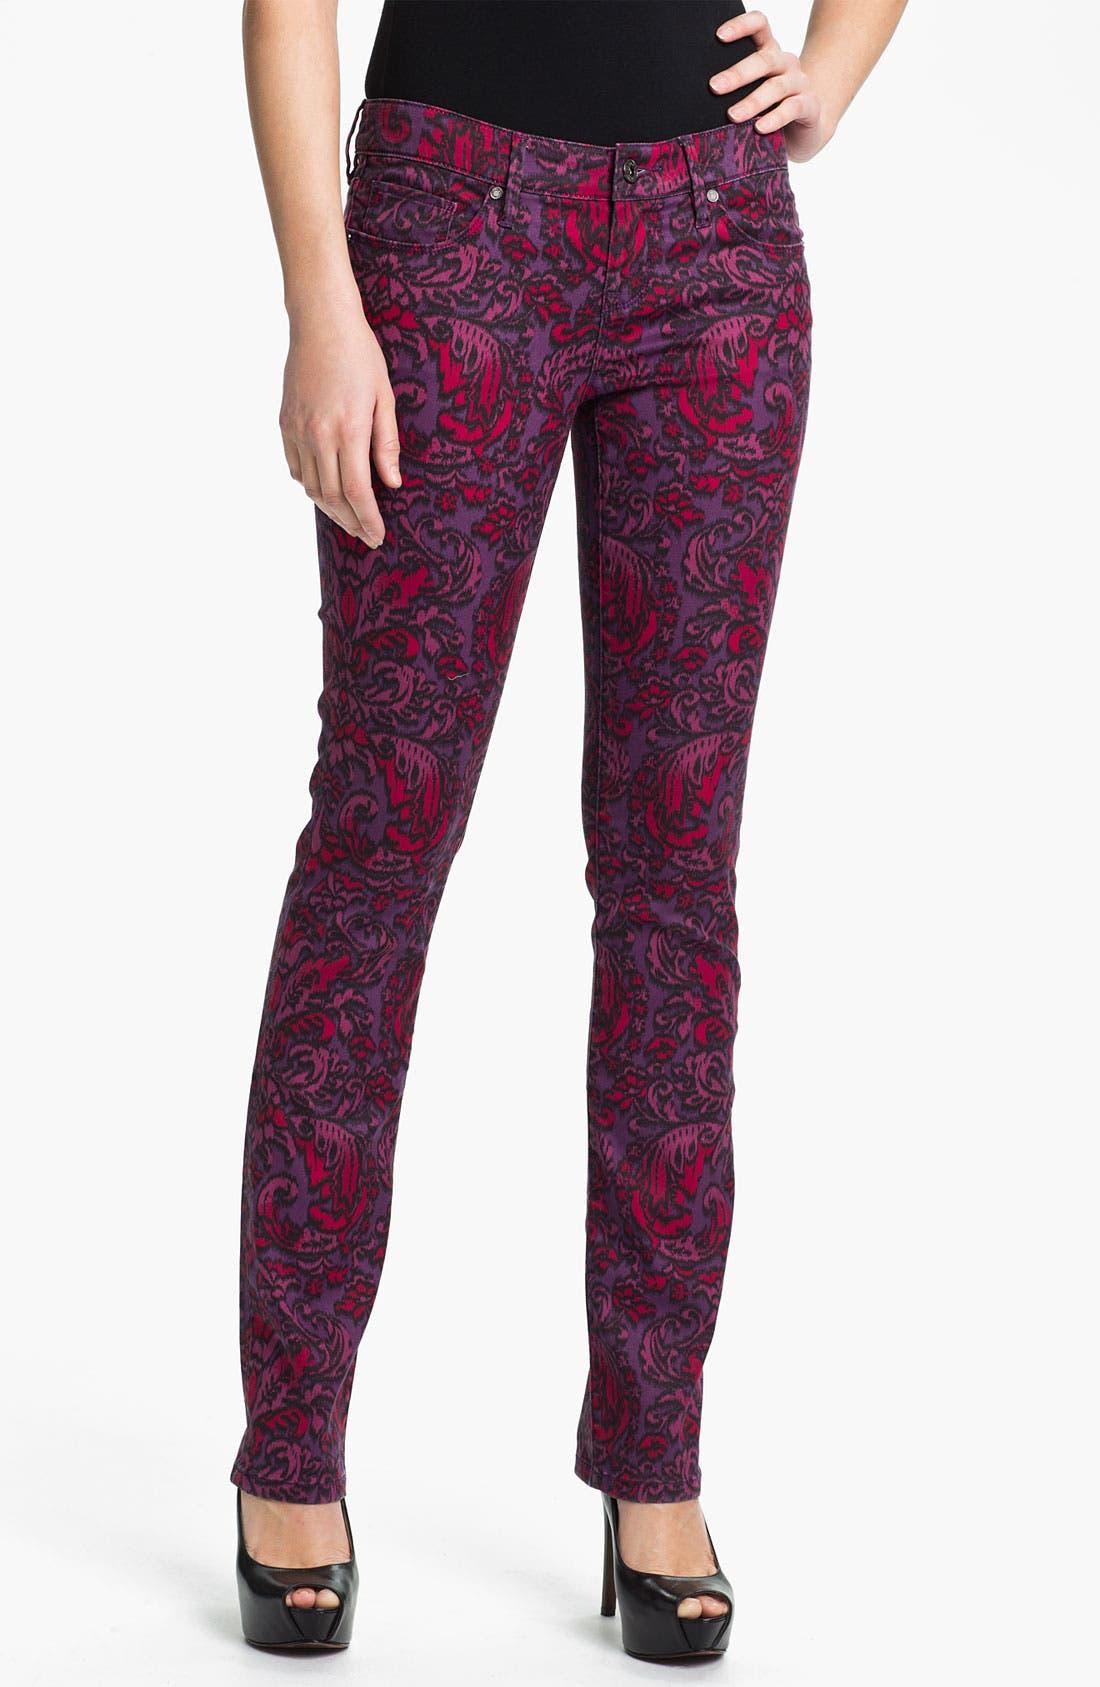 Main Image - Isaac Mizrahi Jeans 'Emma' Straight Leg Print Jeans (Online Exclusive)